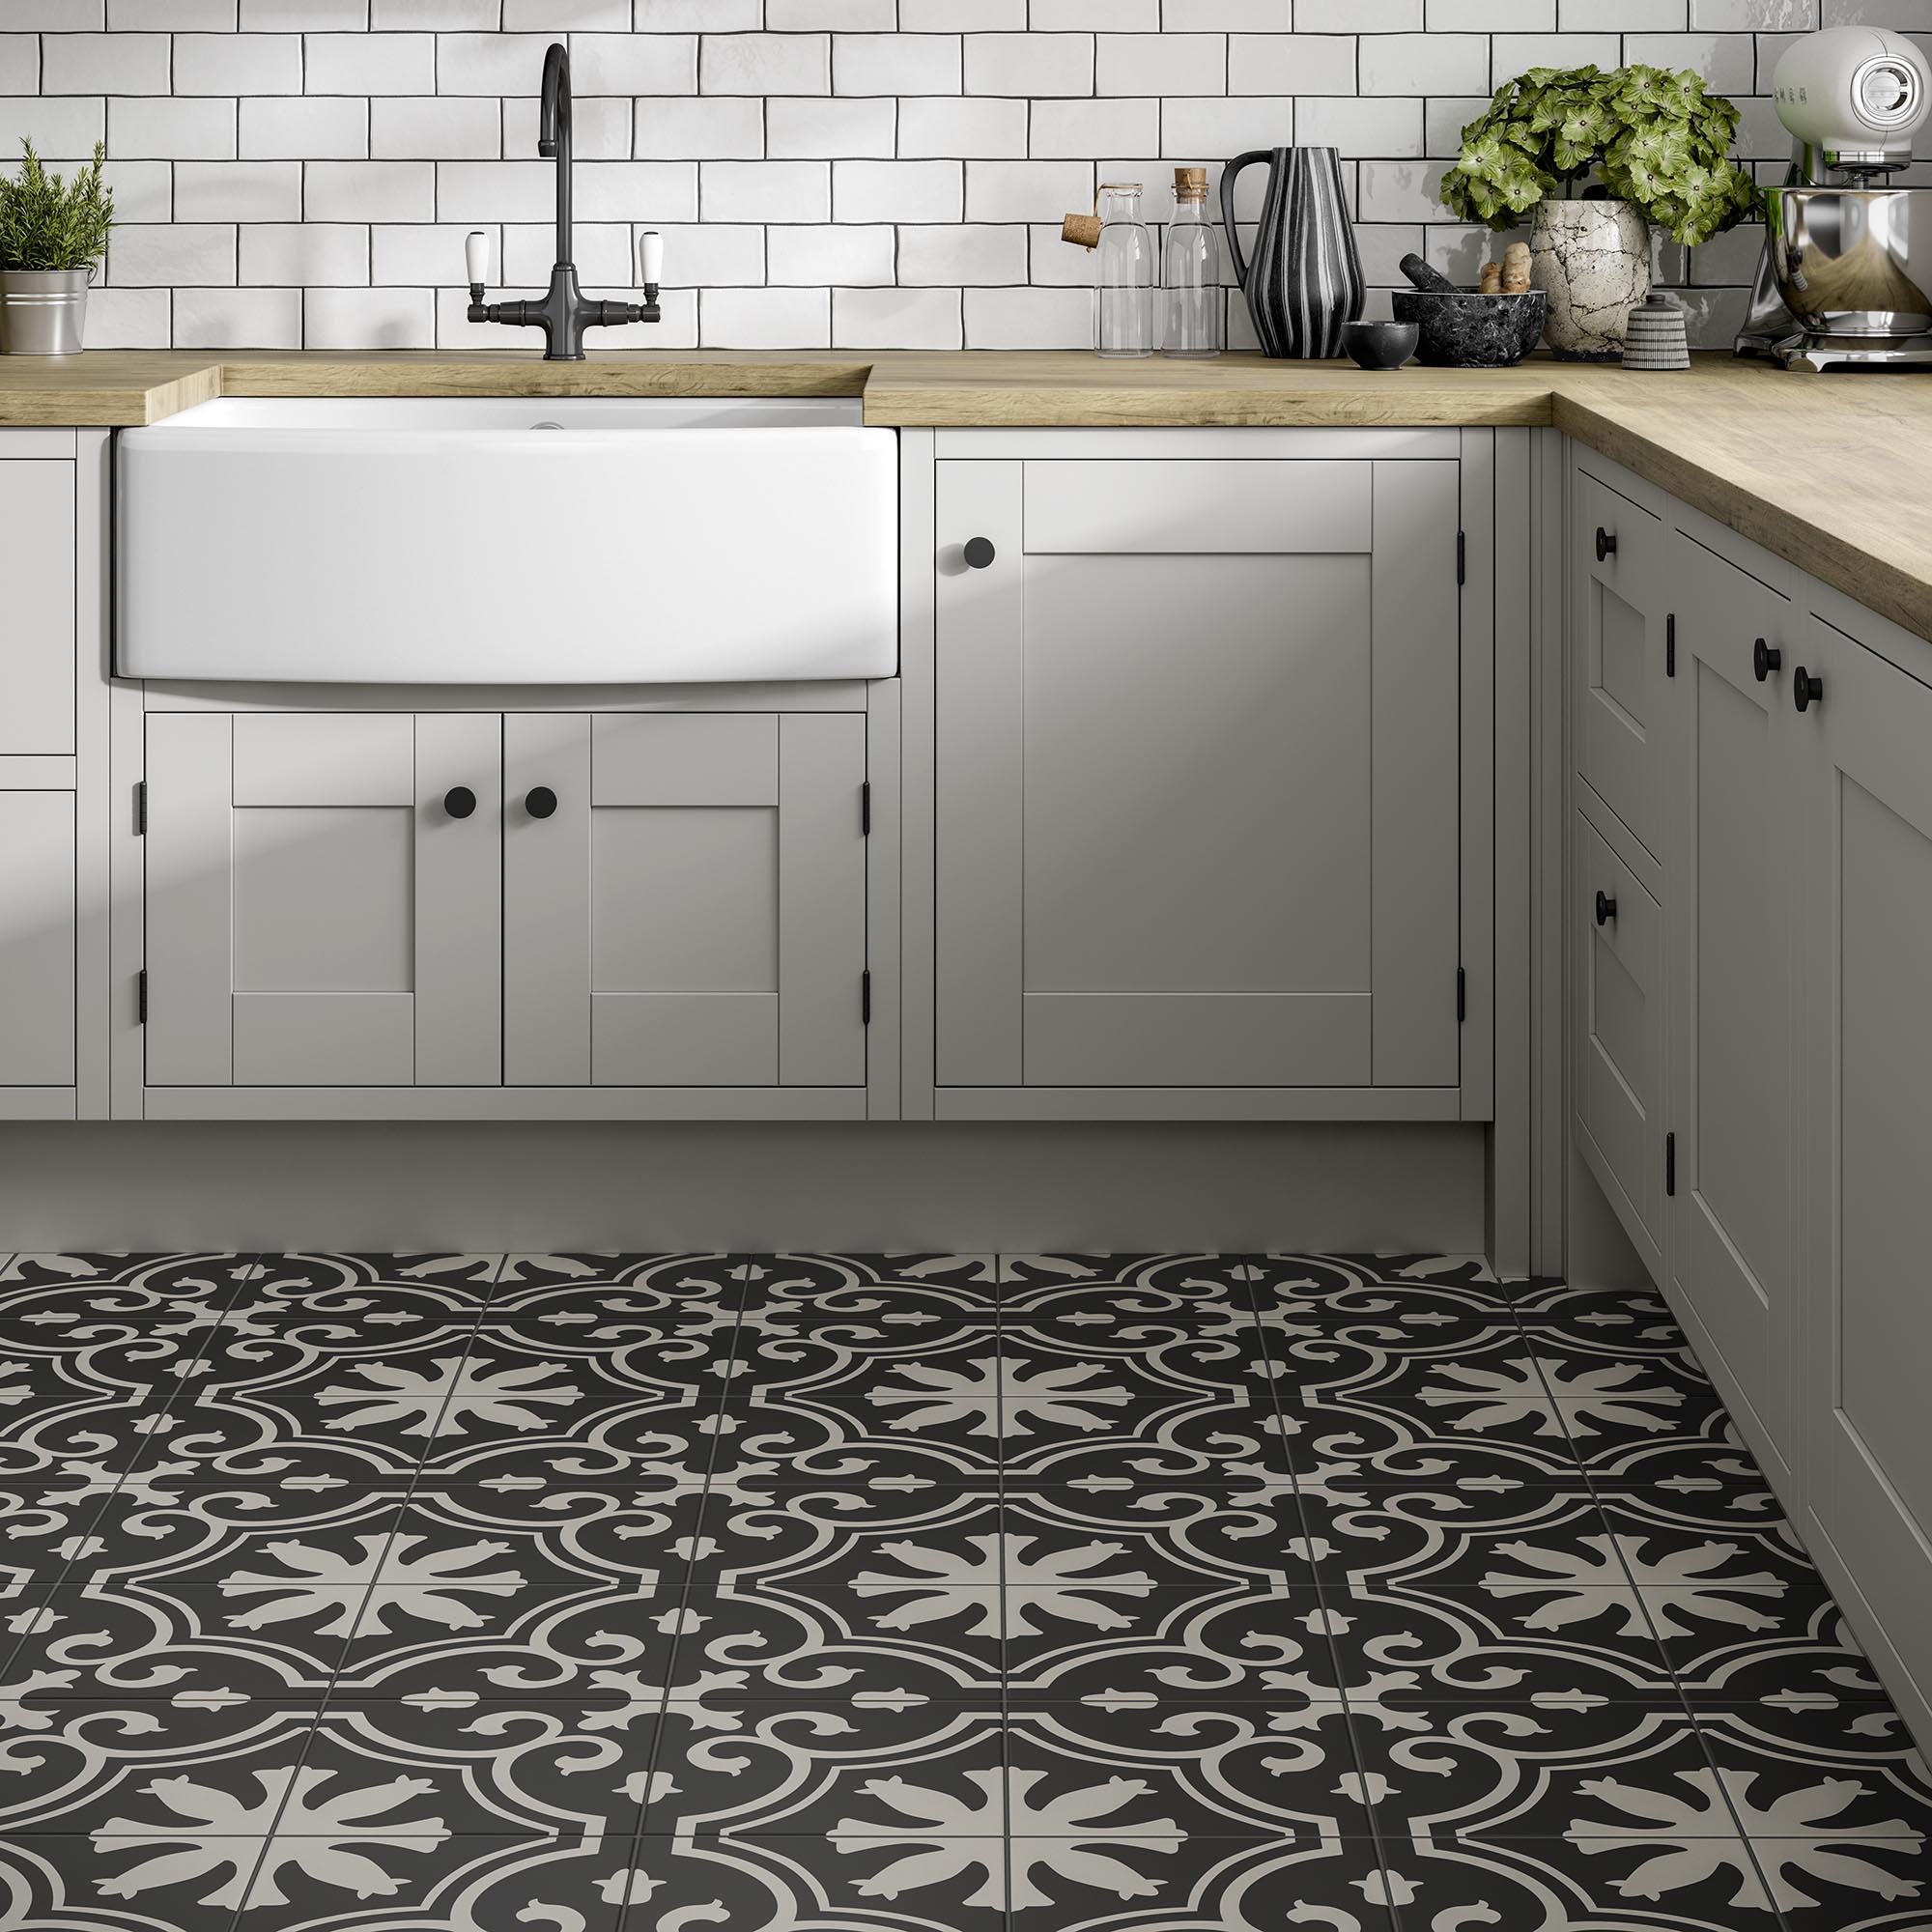 Patterned Tiles 2